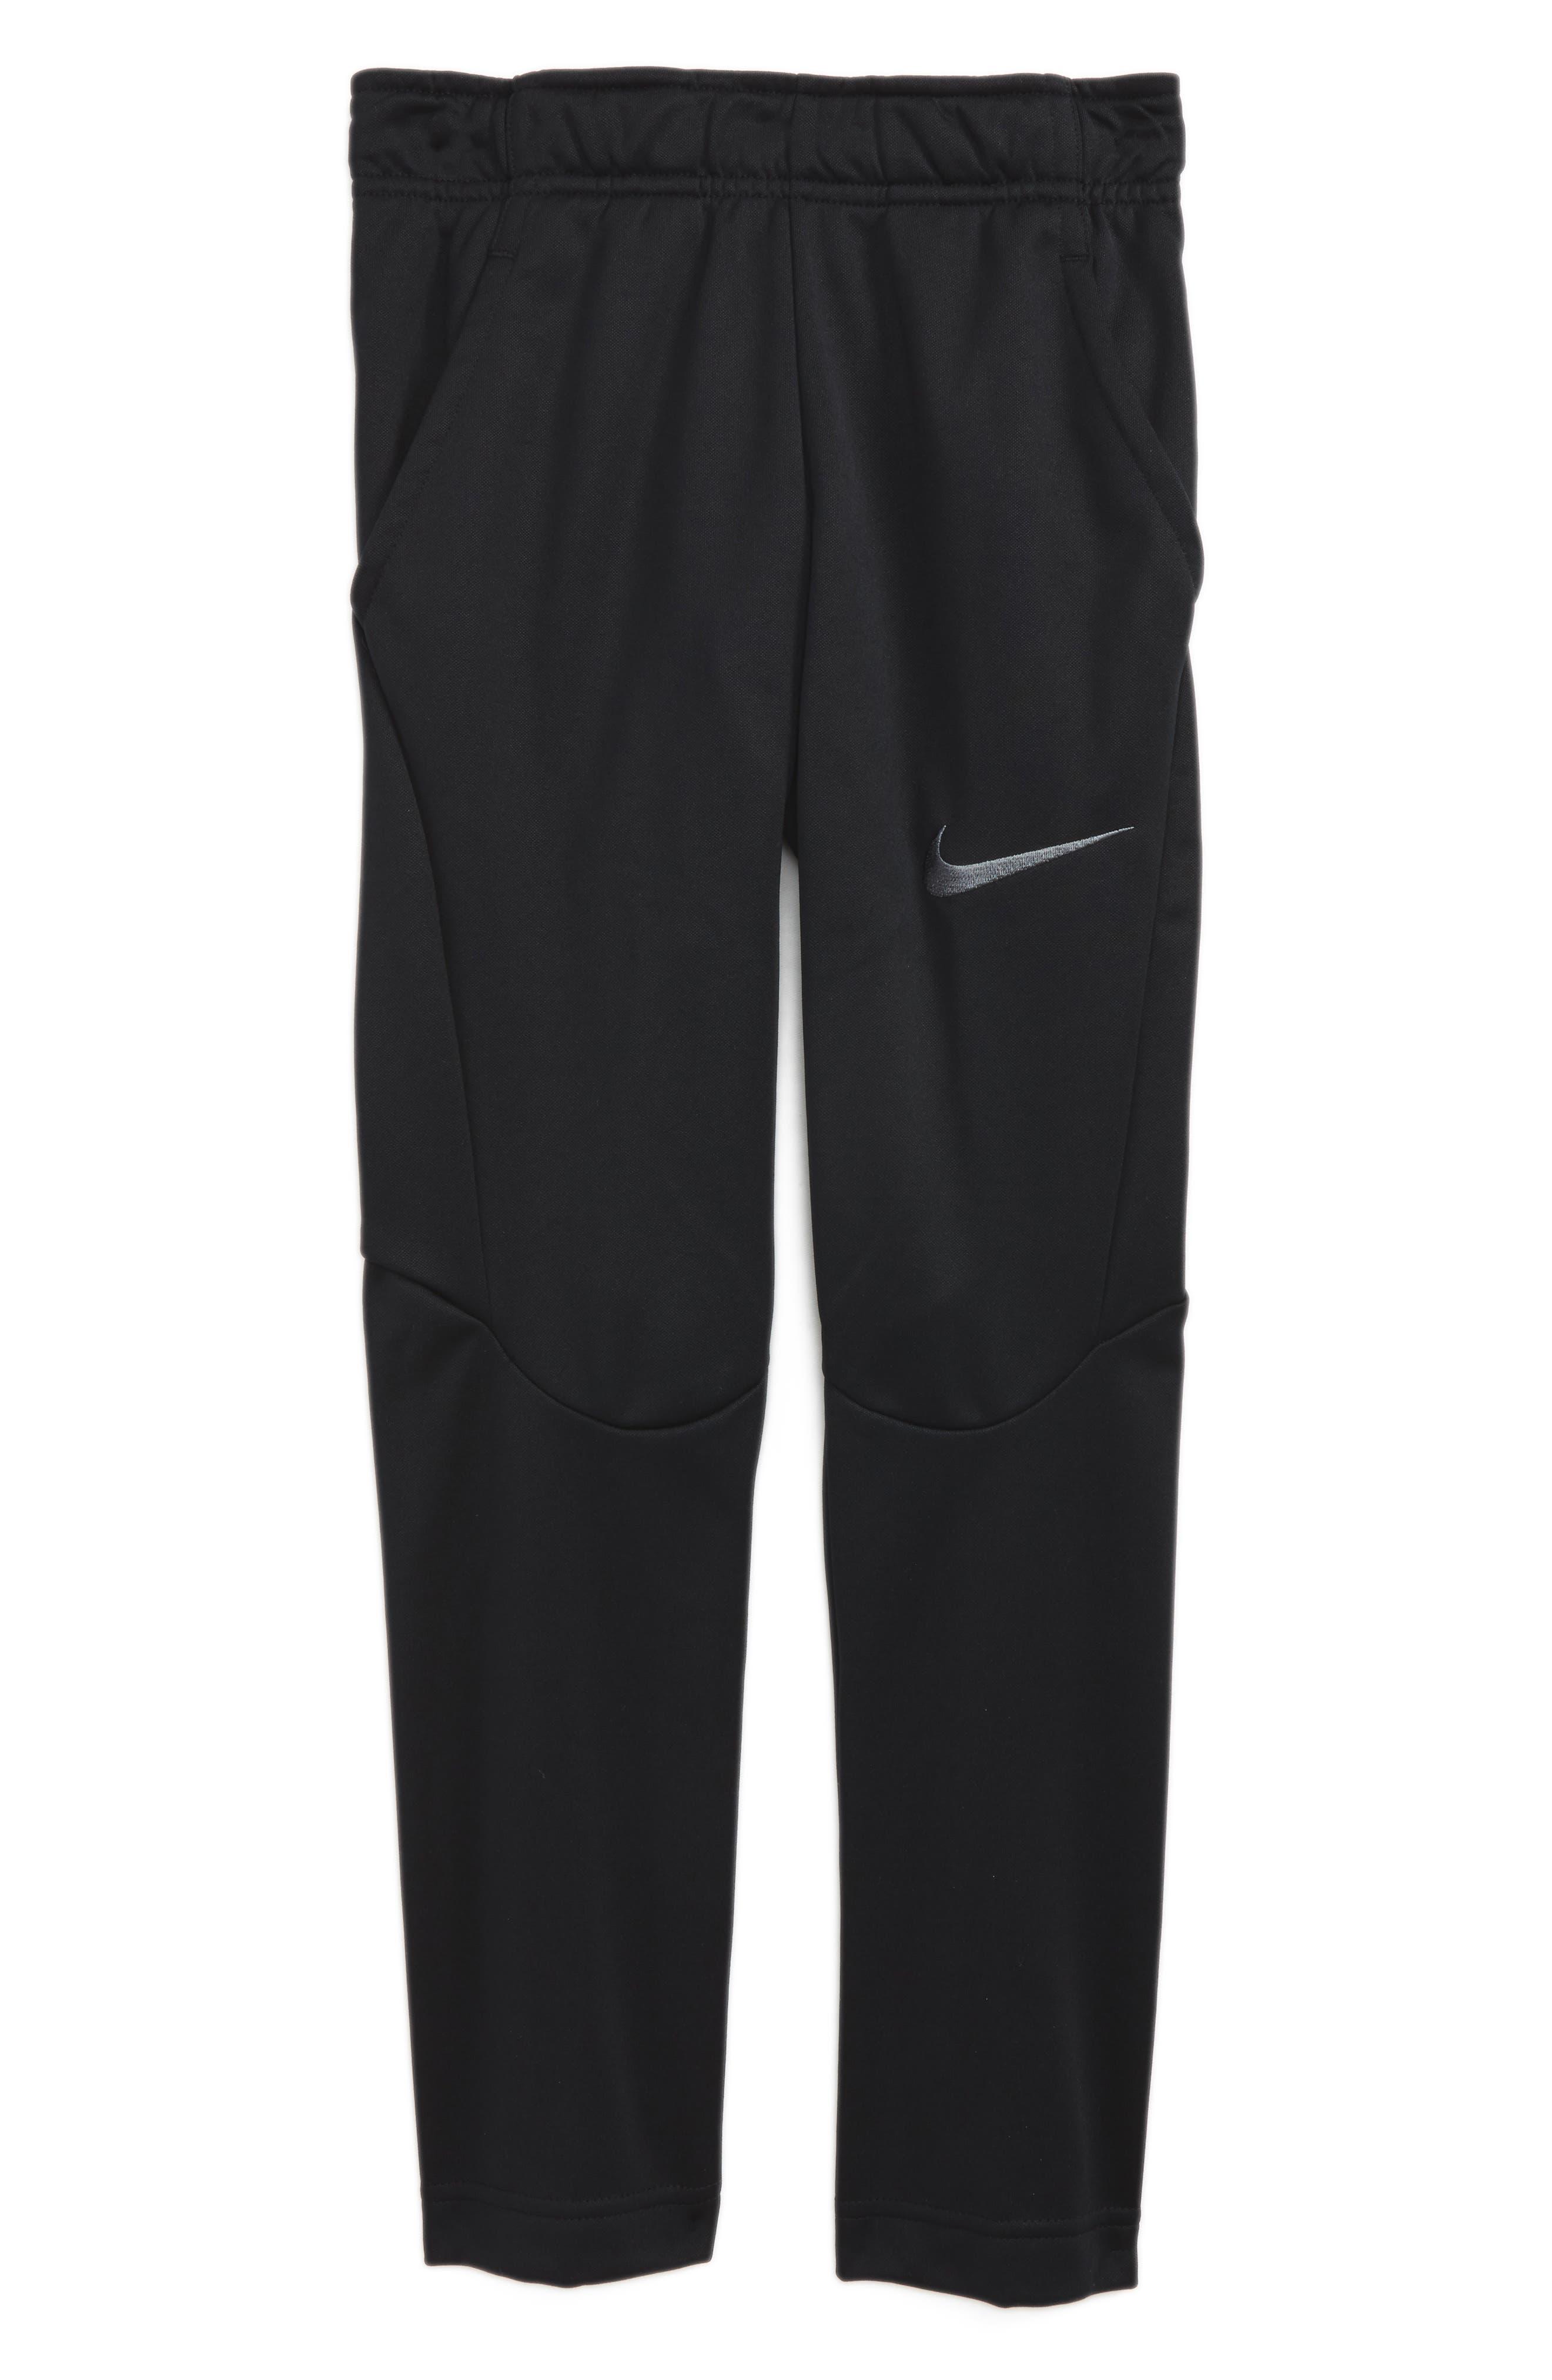 Therma-FIT Training Pants,                             Main thumbnail 1, color,                             Black